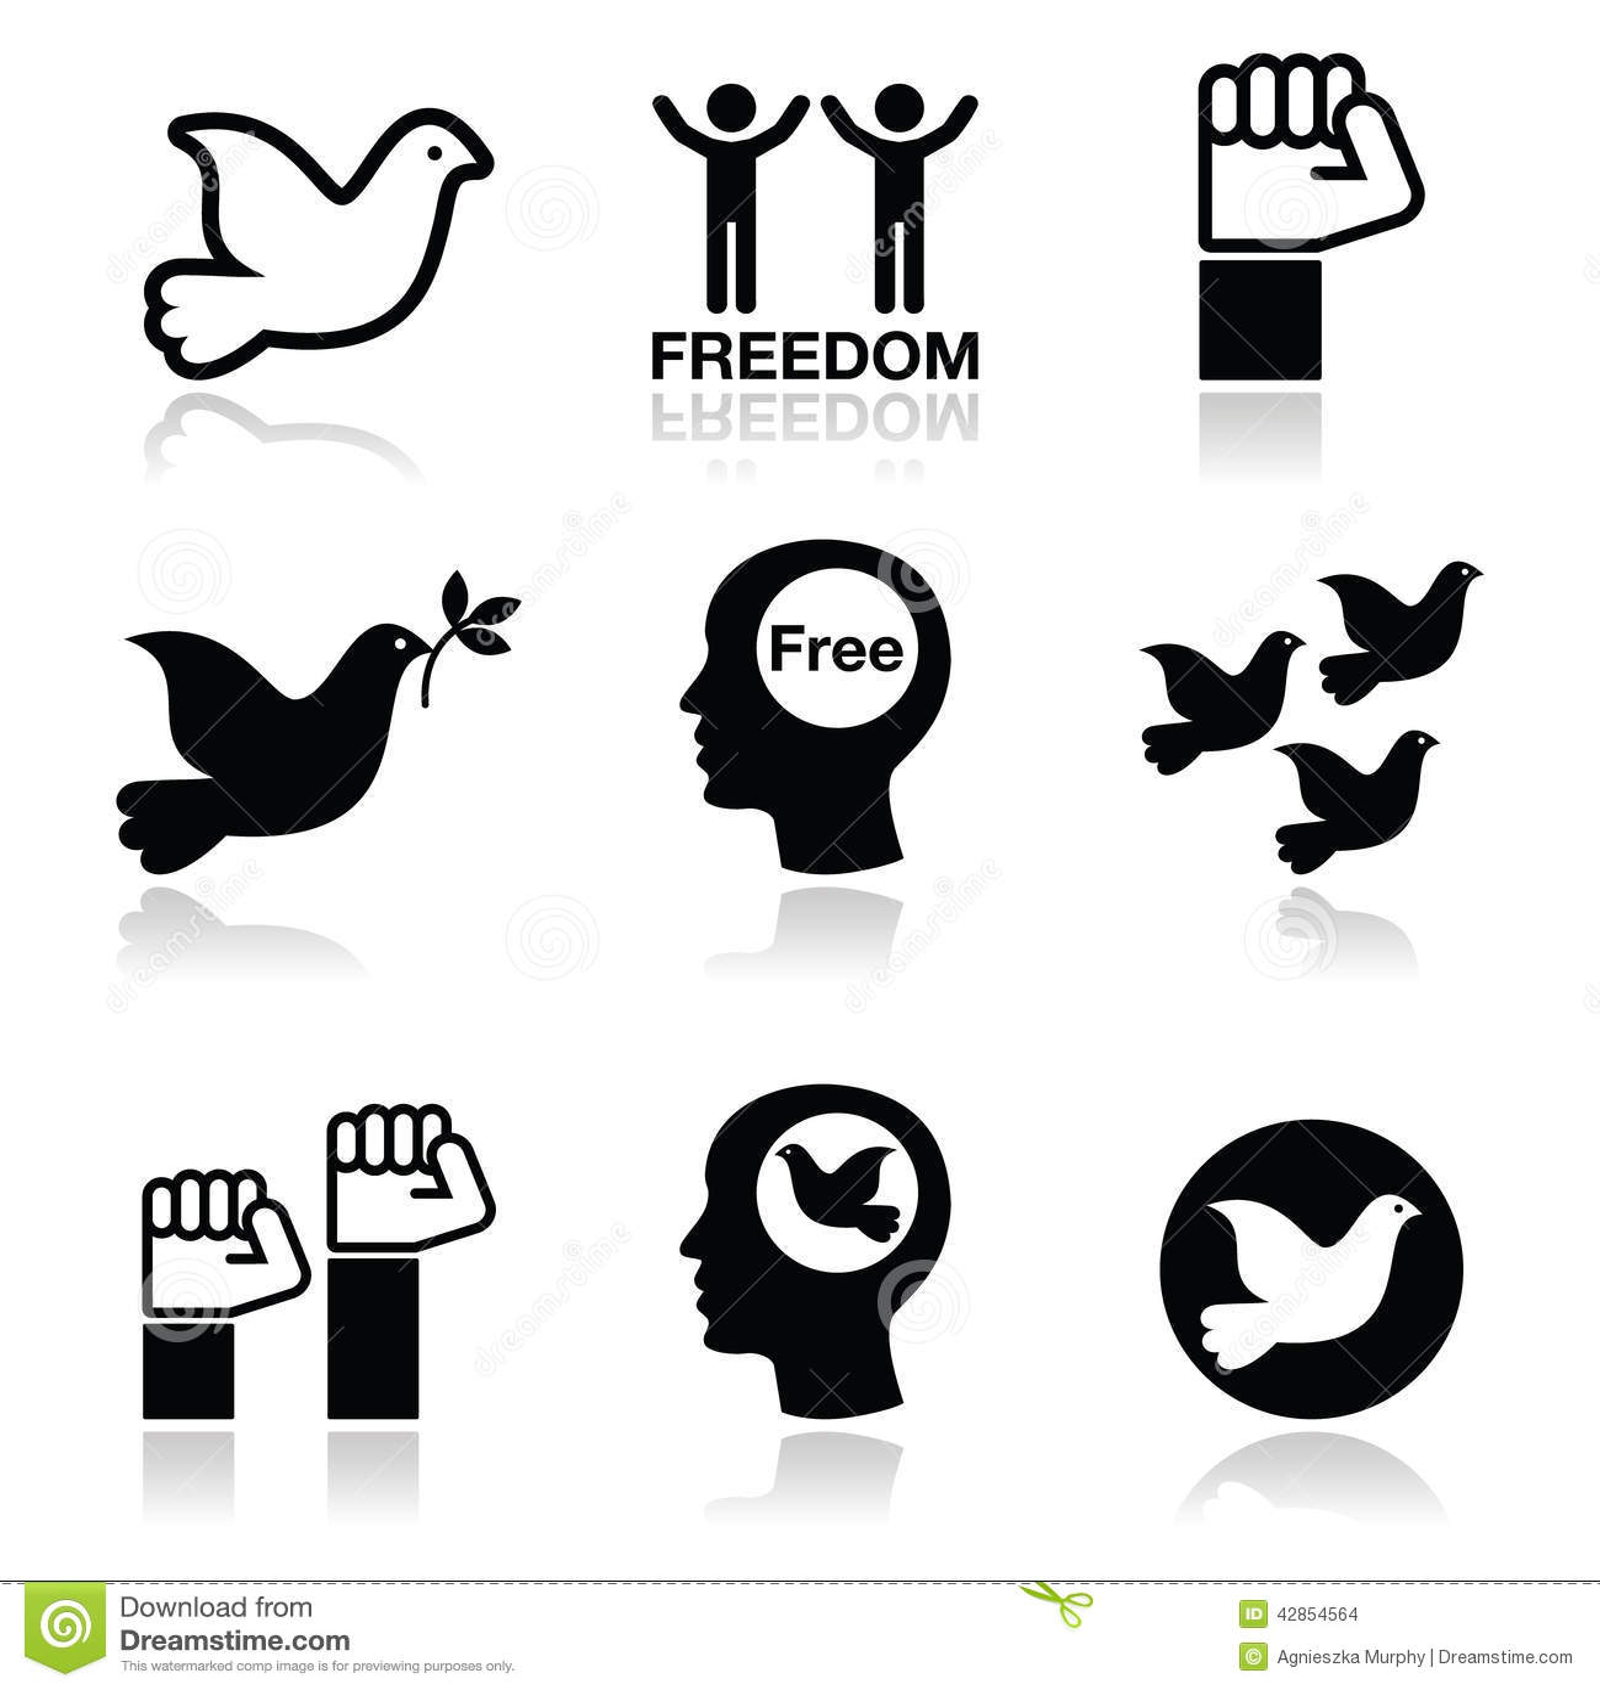 Freedom icons set - dove and fist symbols